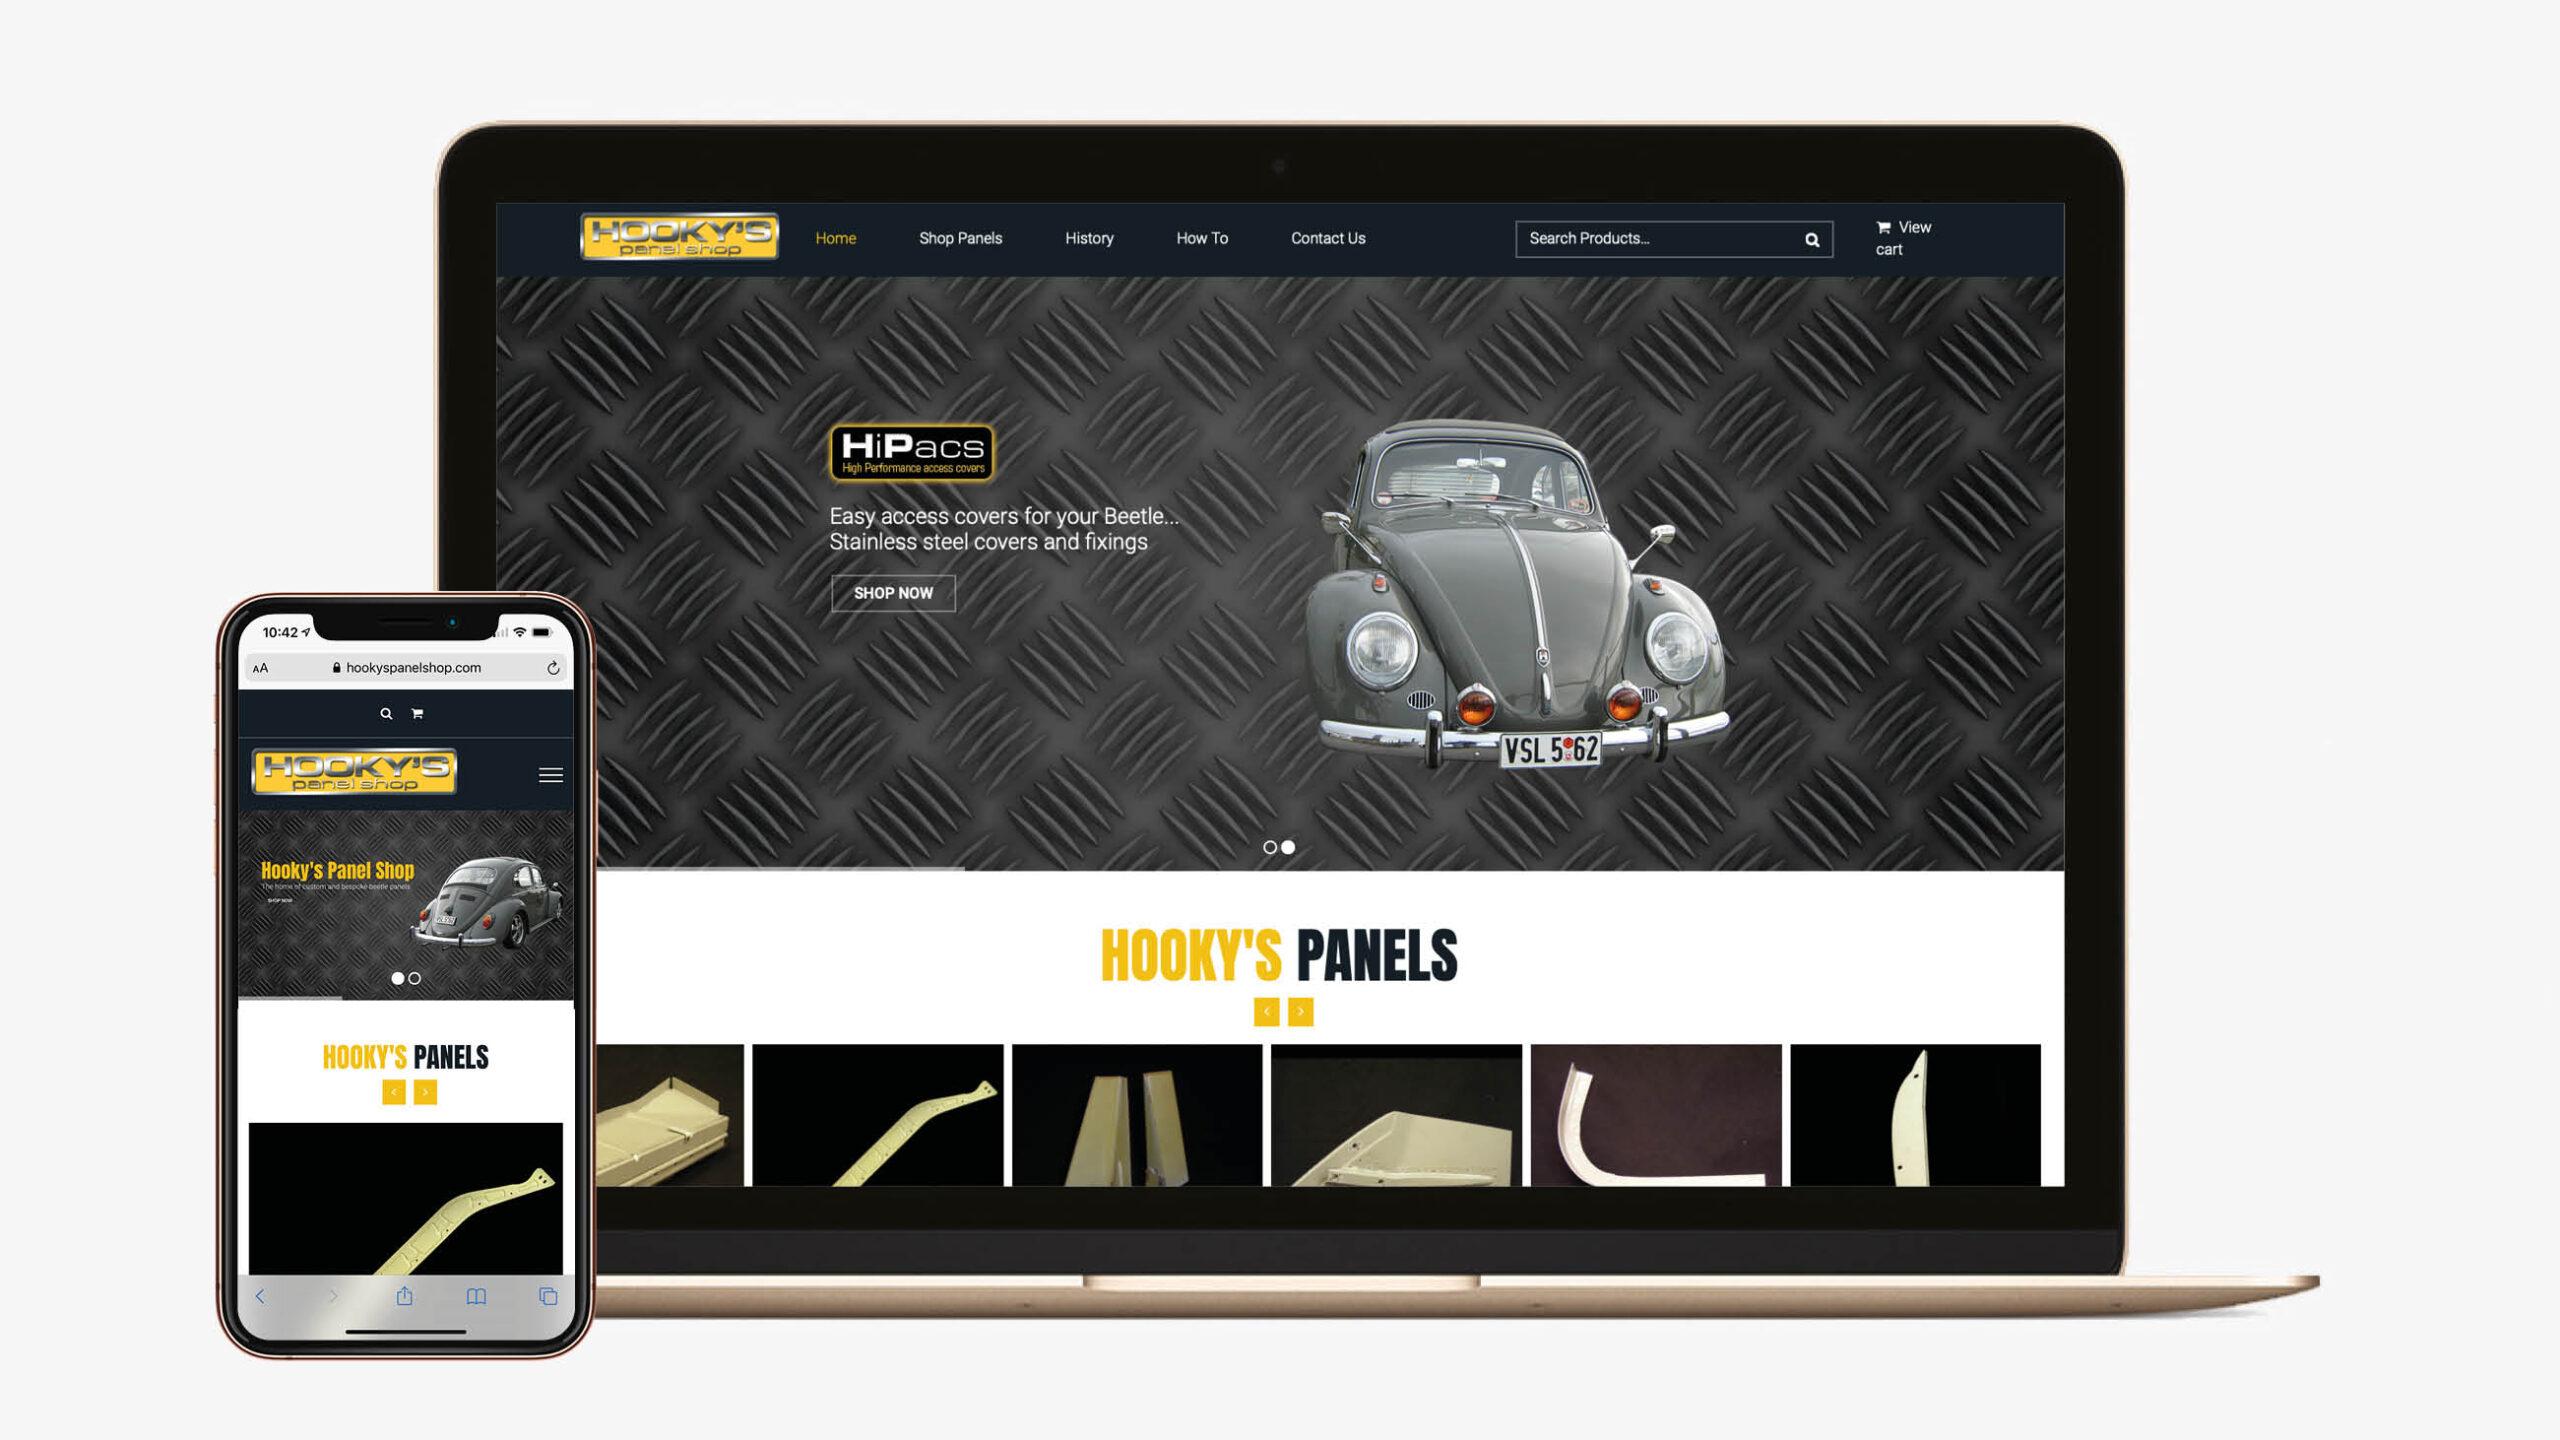 Hookies Panel Shop